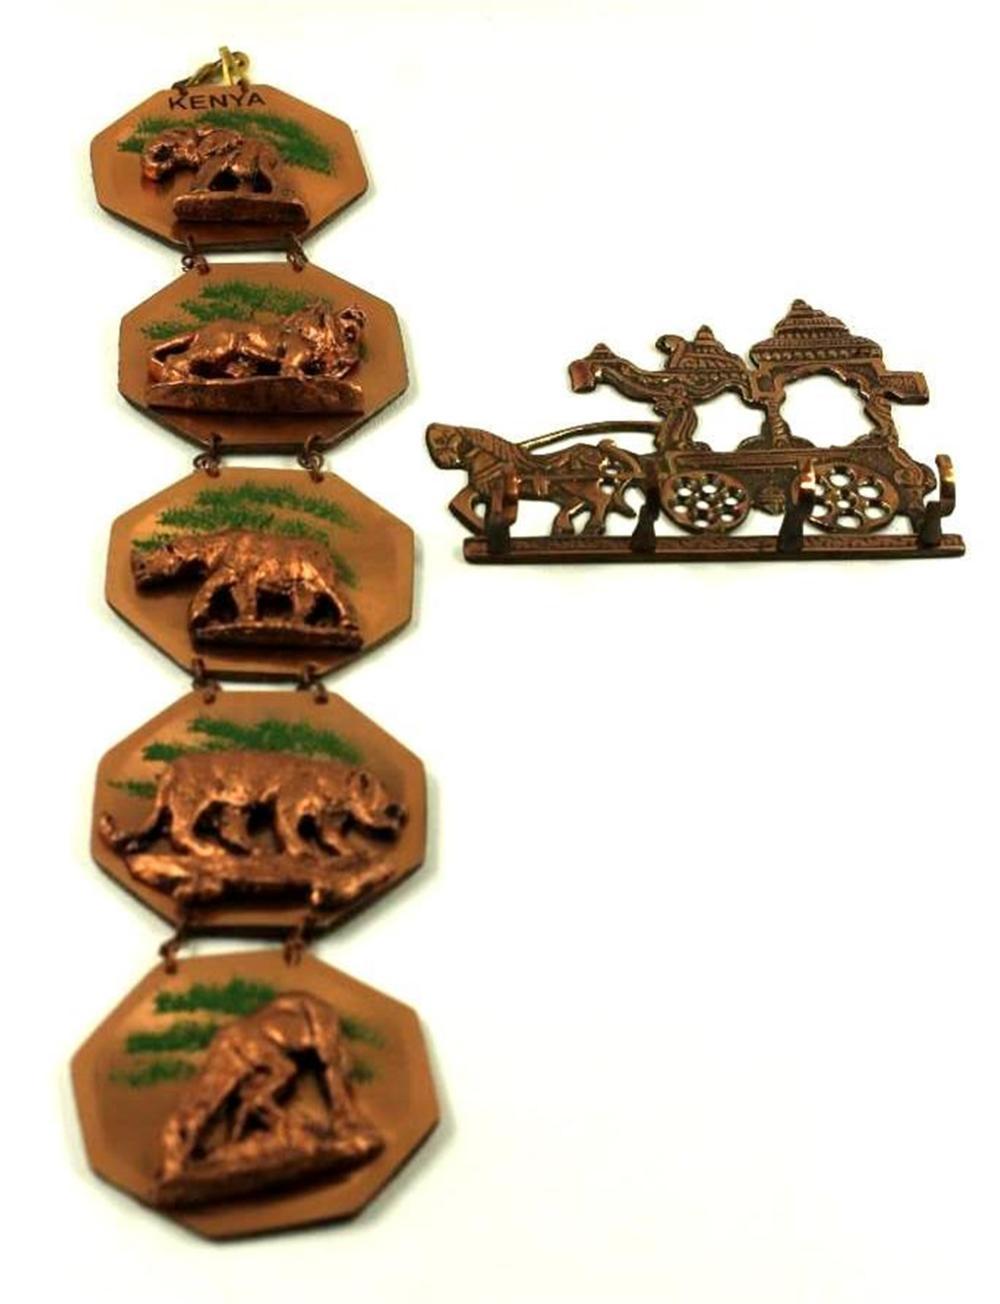 Copper Key Holder and Kenya Souvenir